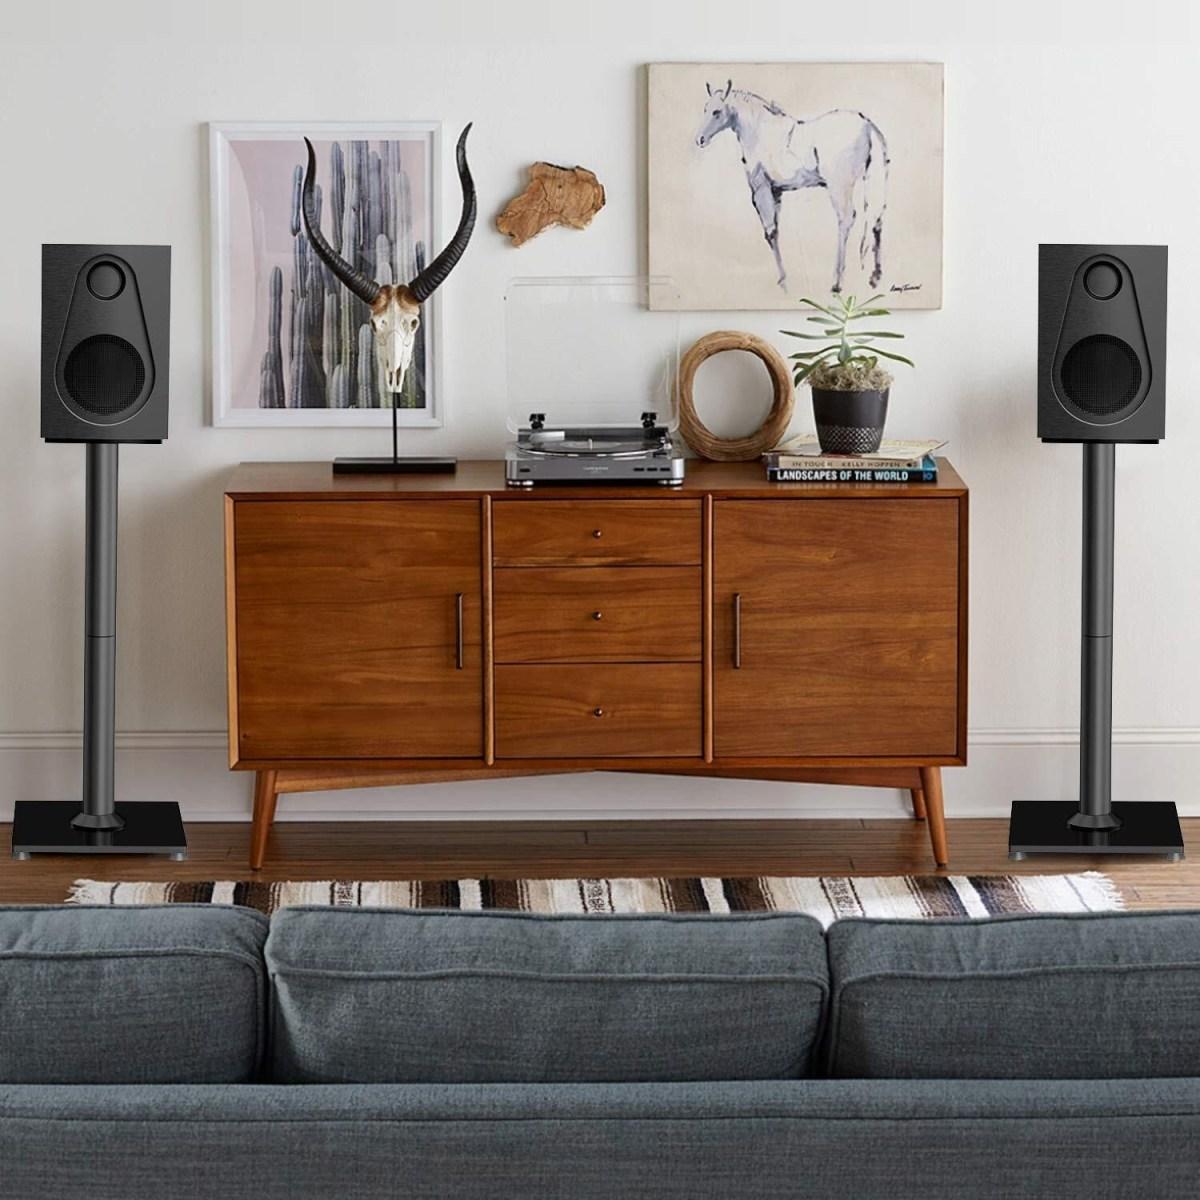 Universal Sleek Appearance Floor Speaker Stands